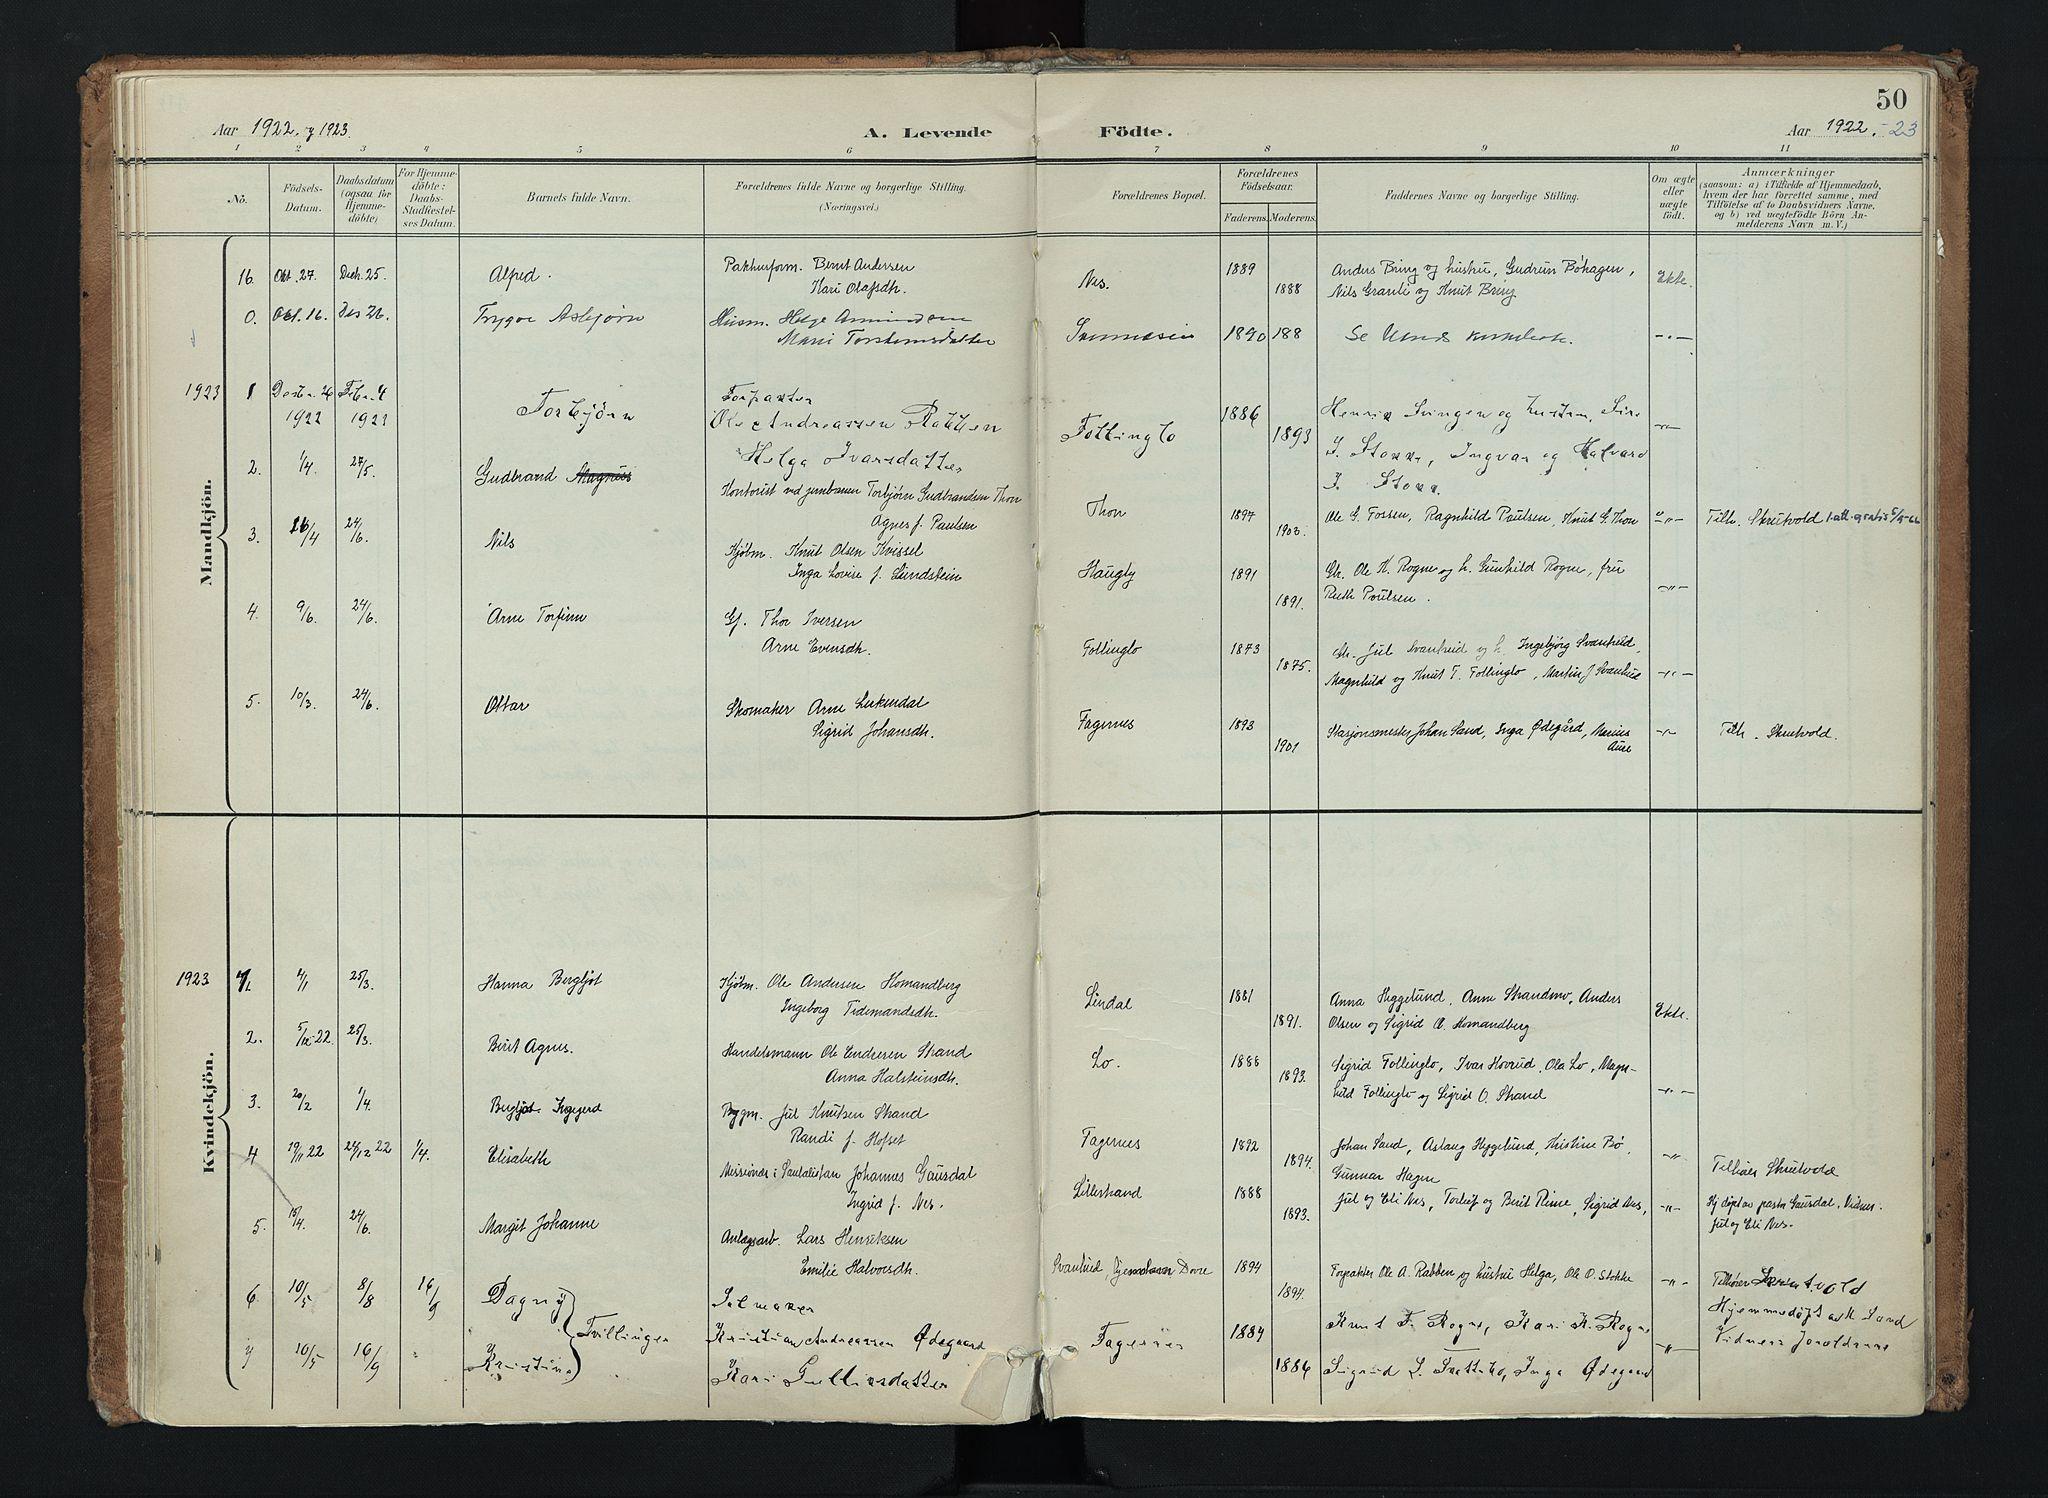 SAH, Nord-Aurdal prestekontor, Ministerialbok nr. 16, 1897-1925, s. 50